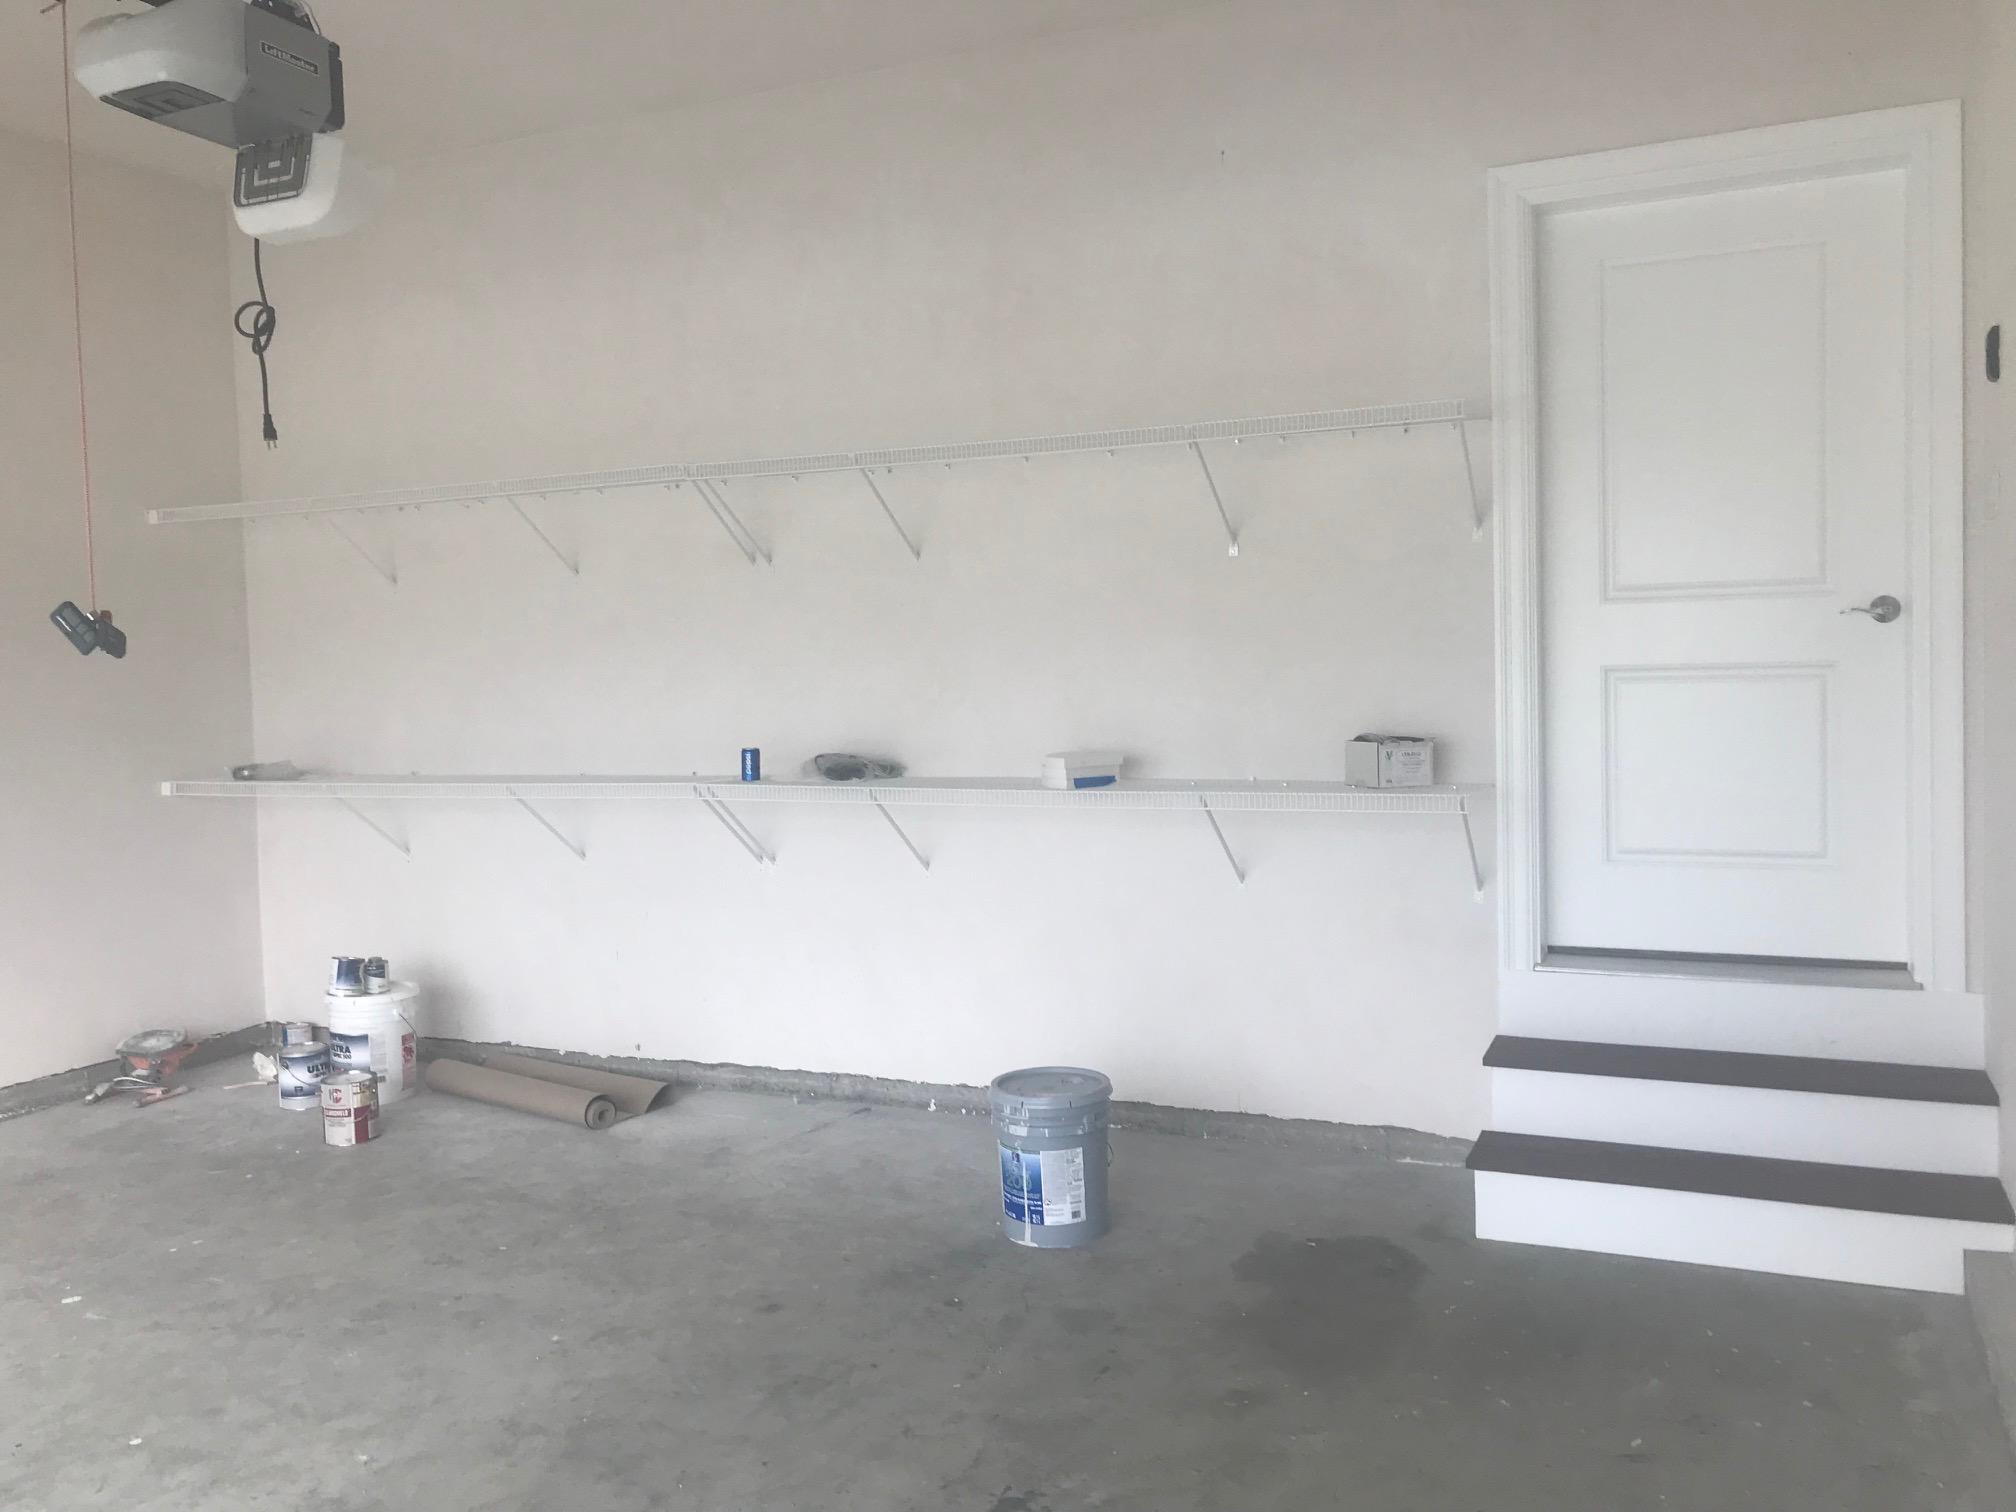 Wire Shelving in Garage